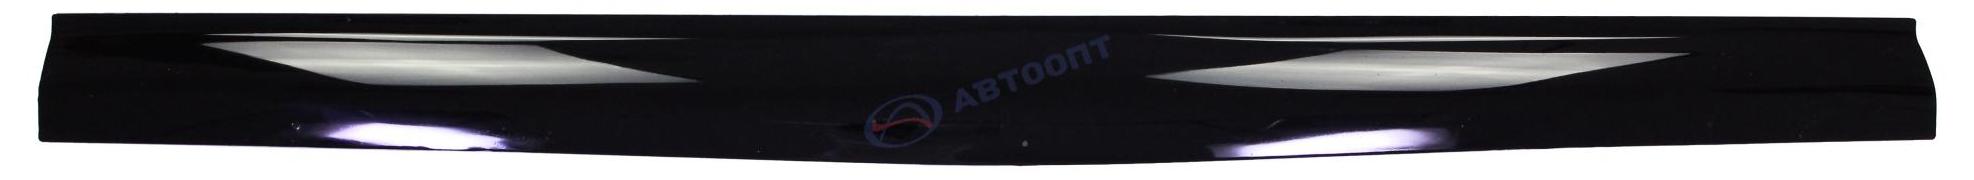 Дефлектор капота ВАЗ-2106 (мухобойка) (МУХ00008)